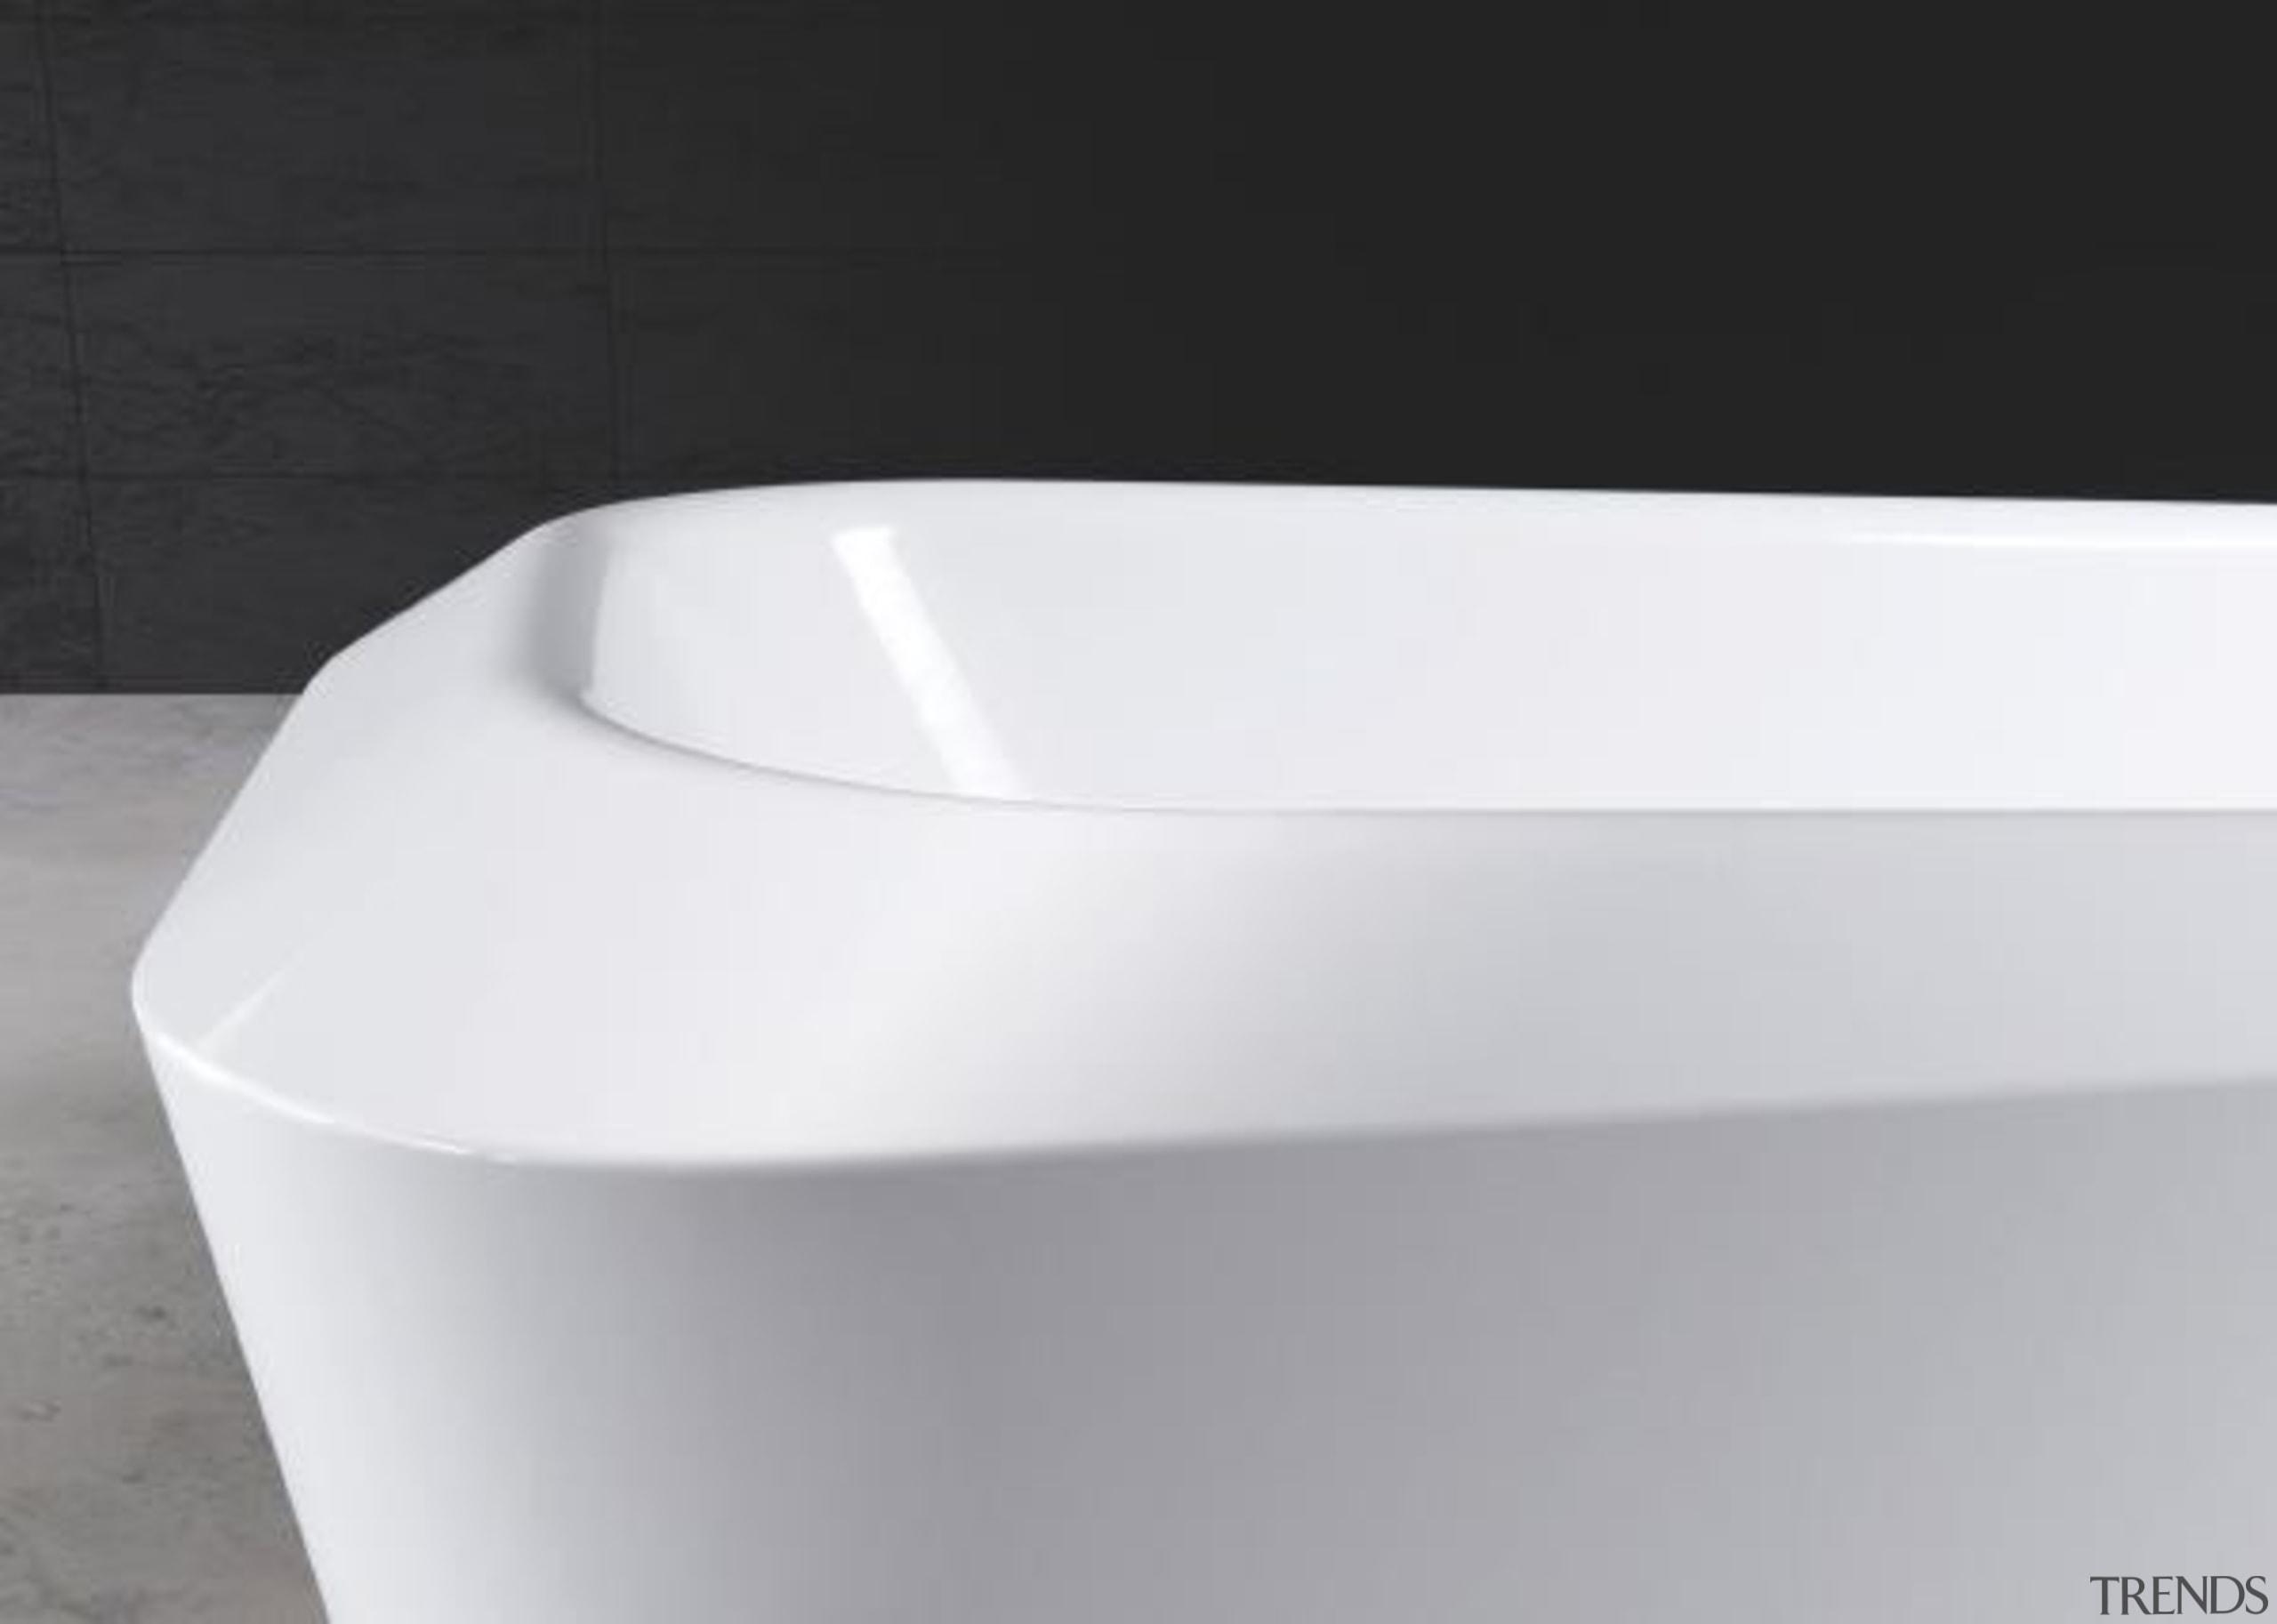 Working with star designer Arik Levy, Kaldewei has angle, bathroom sink, bathtub, hardware, plumbing fixture, product design, tap, toilet seat, white, black